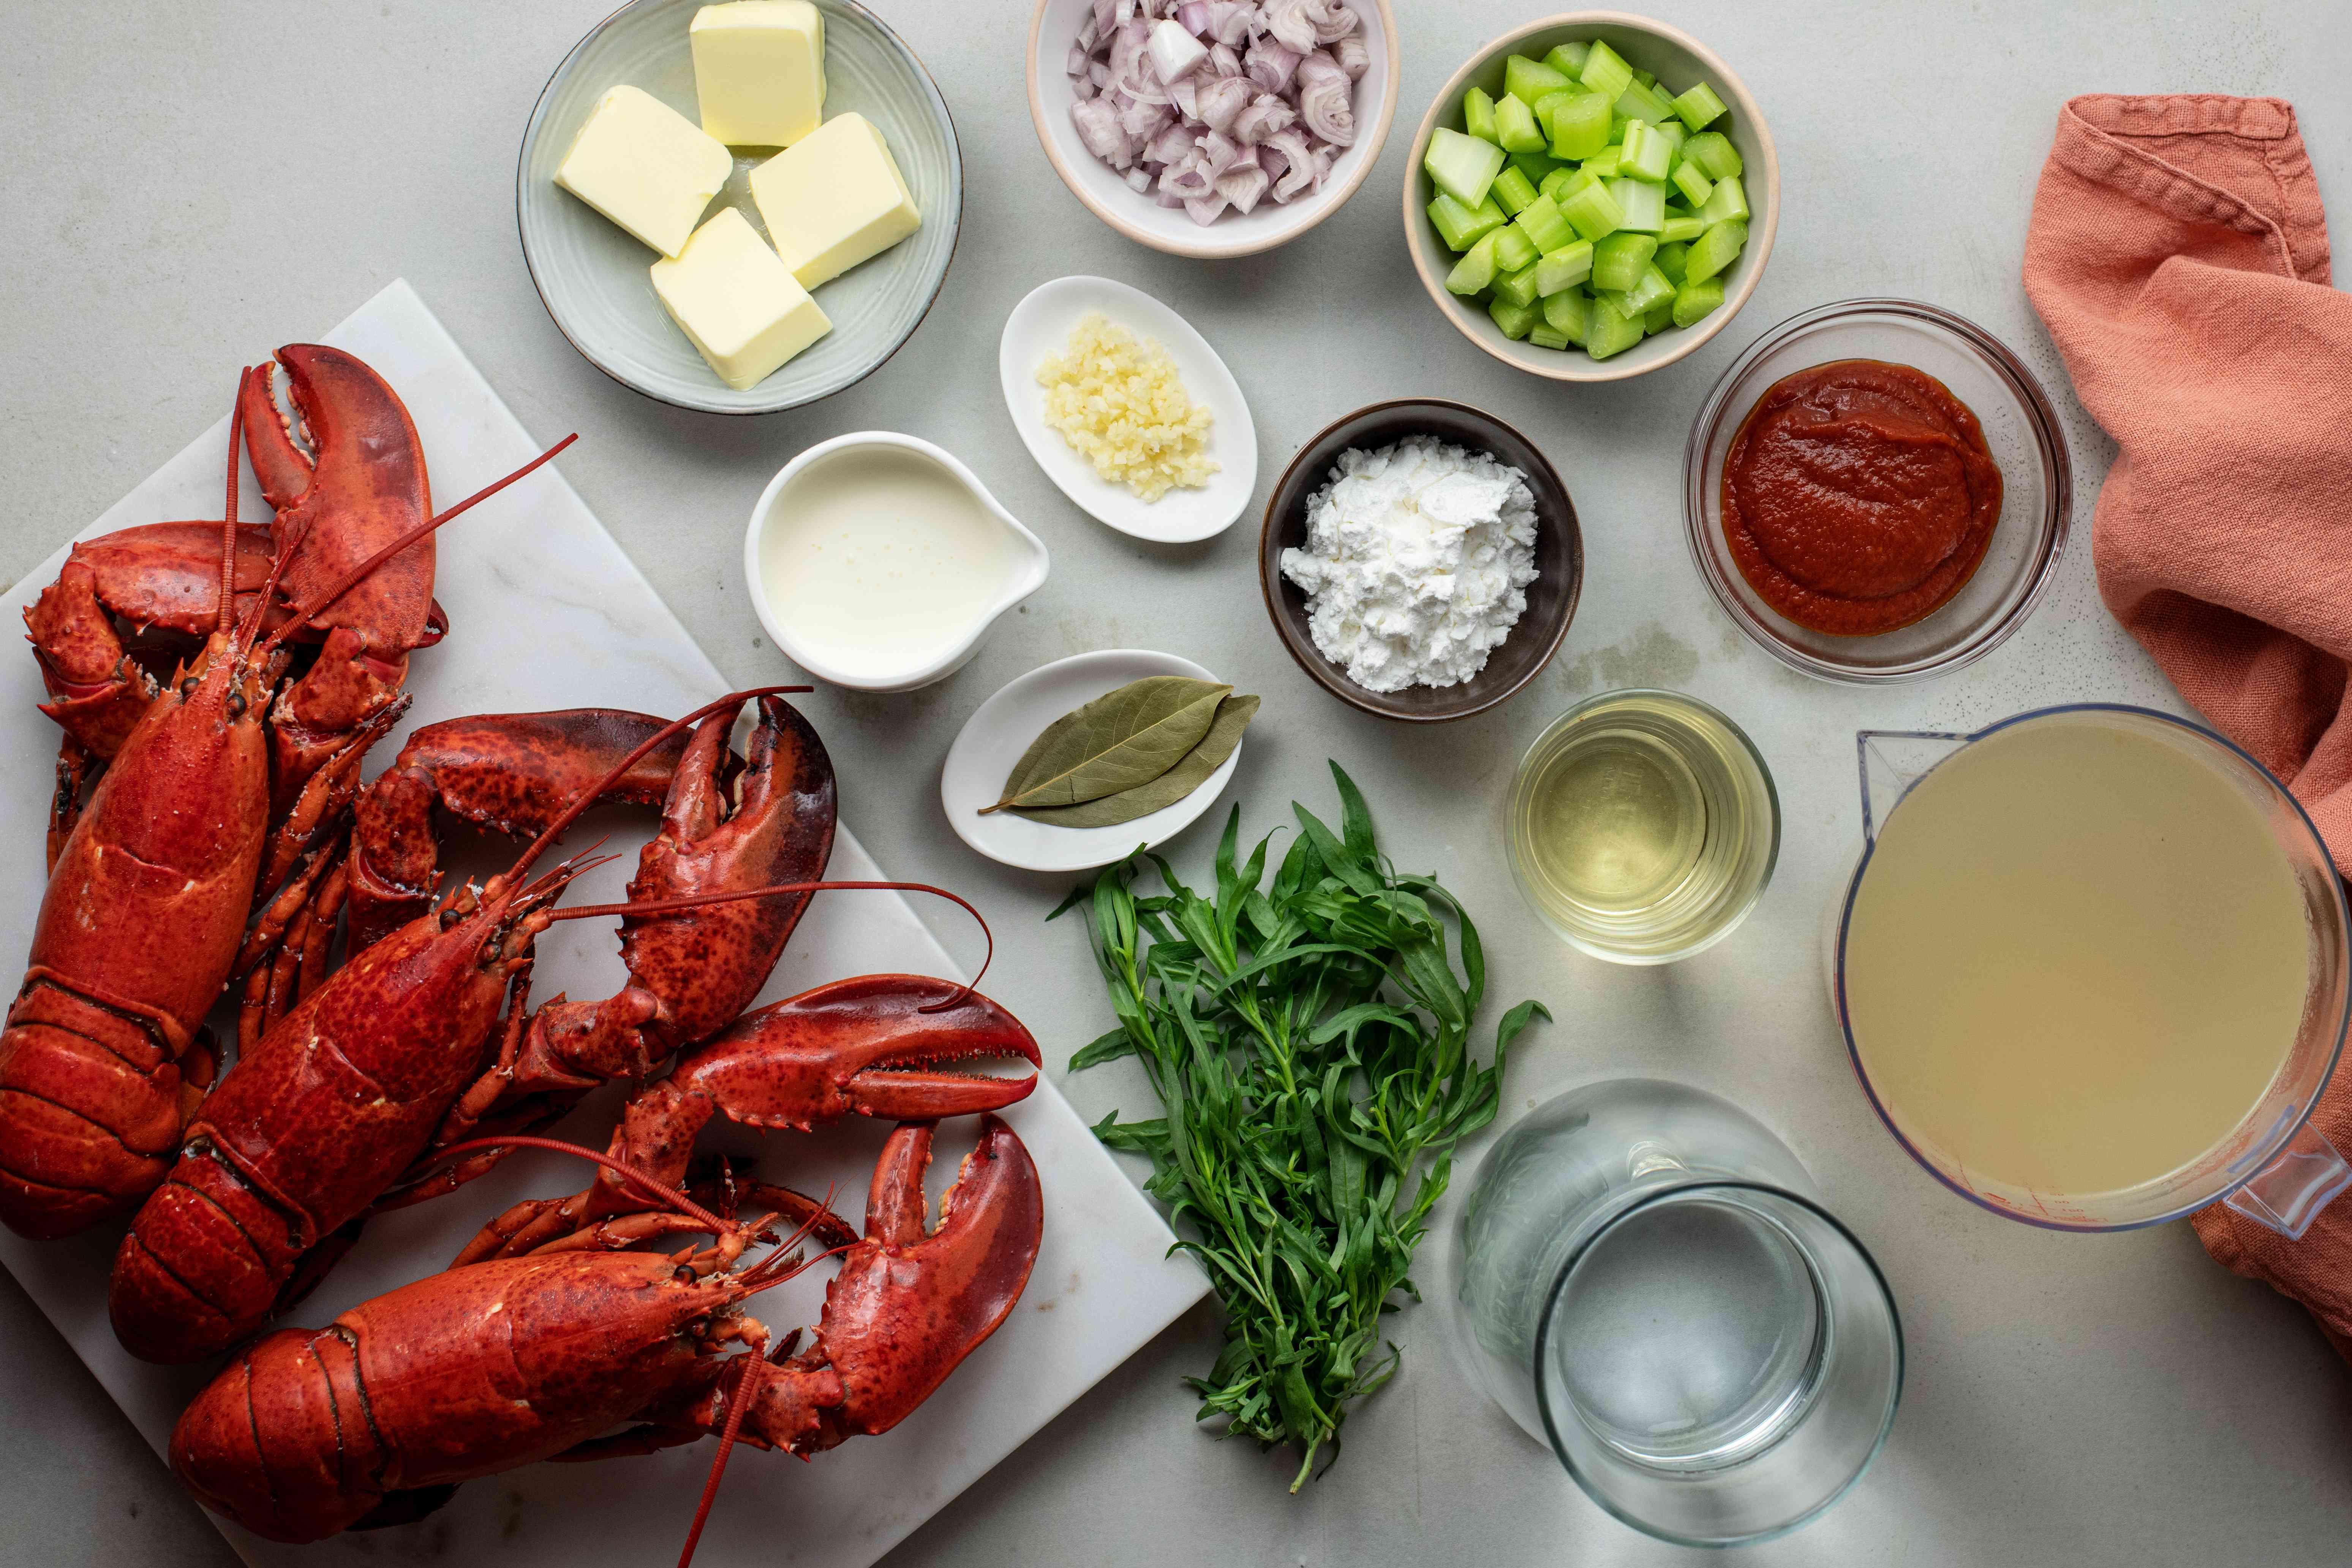 Ingredients for lobster bisque